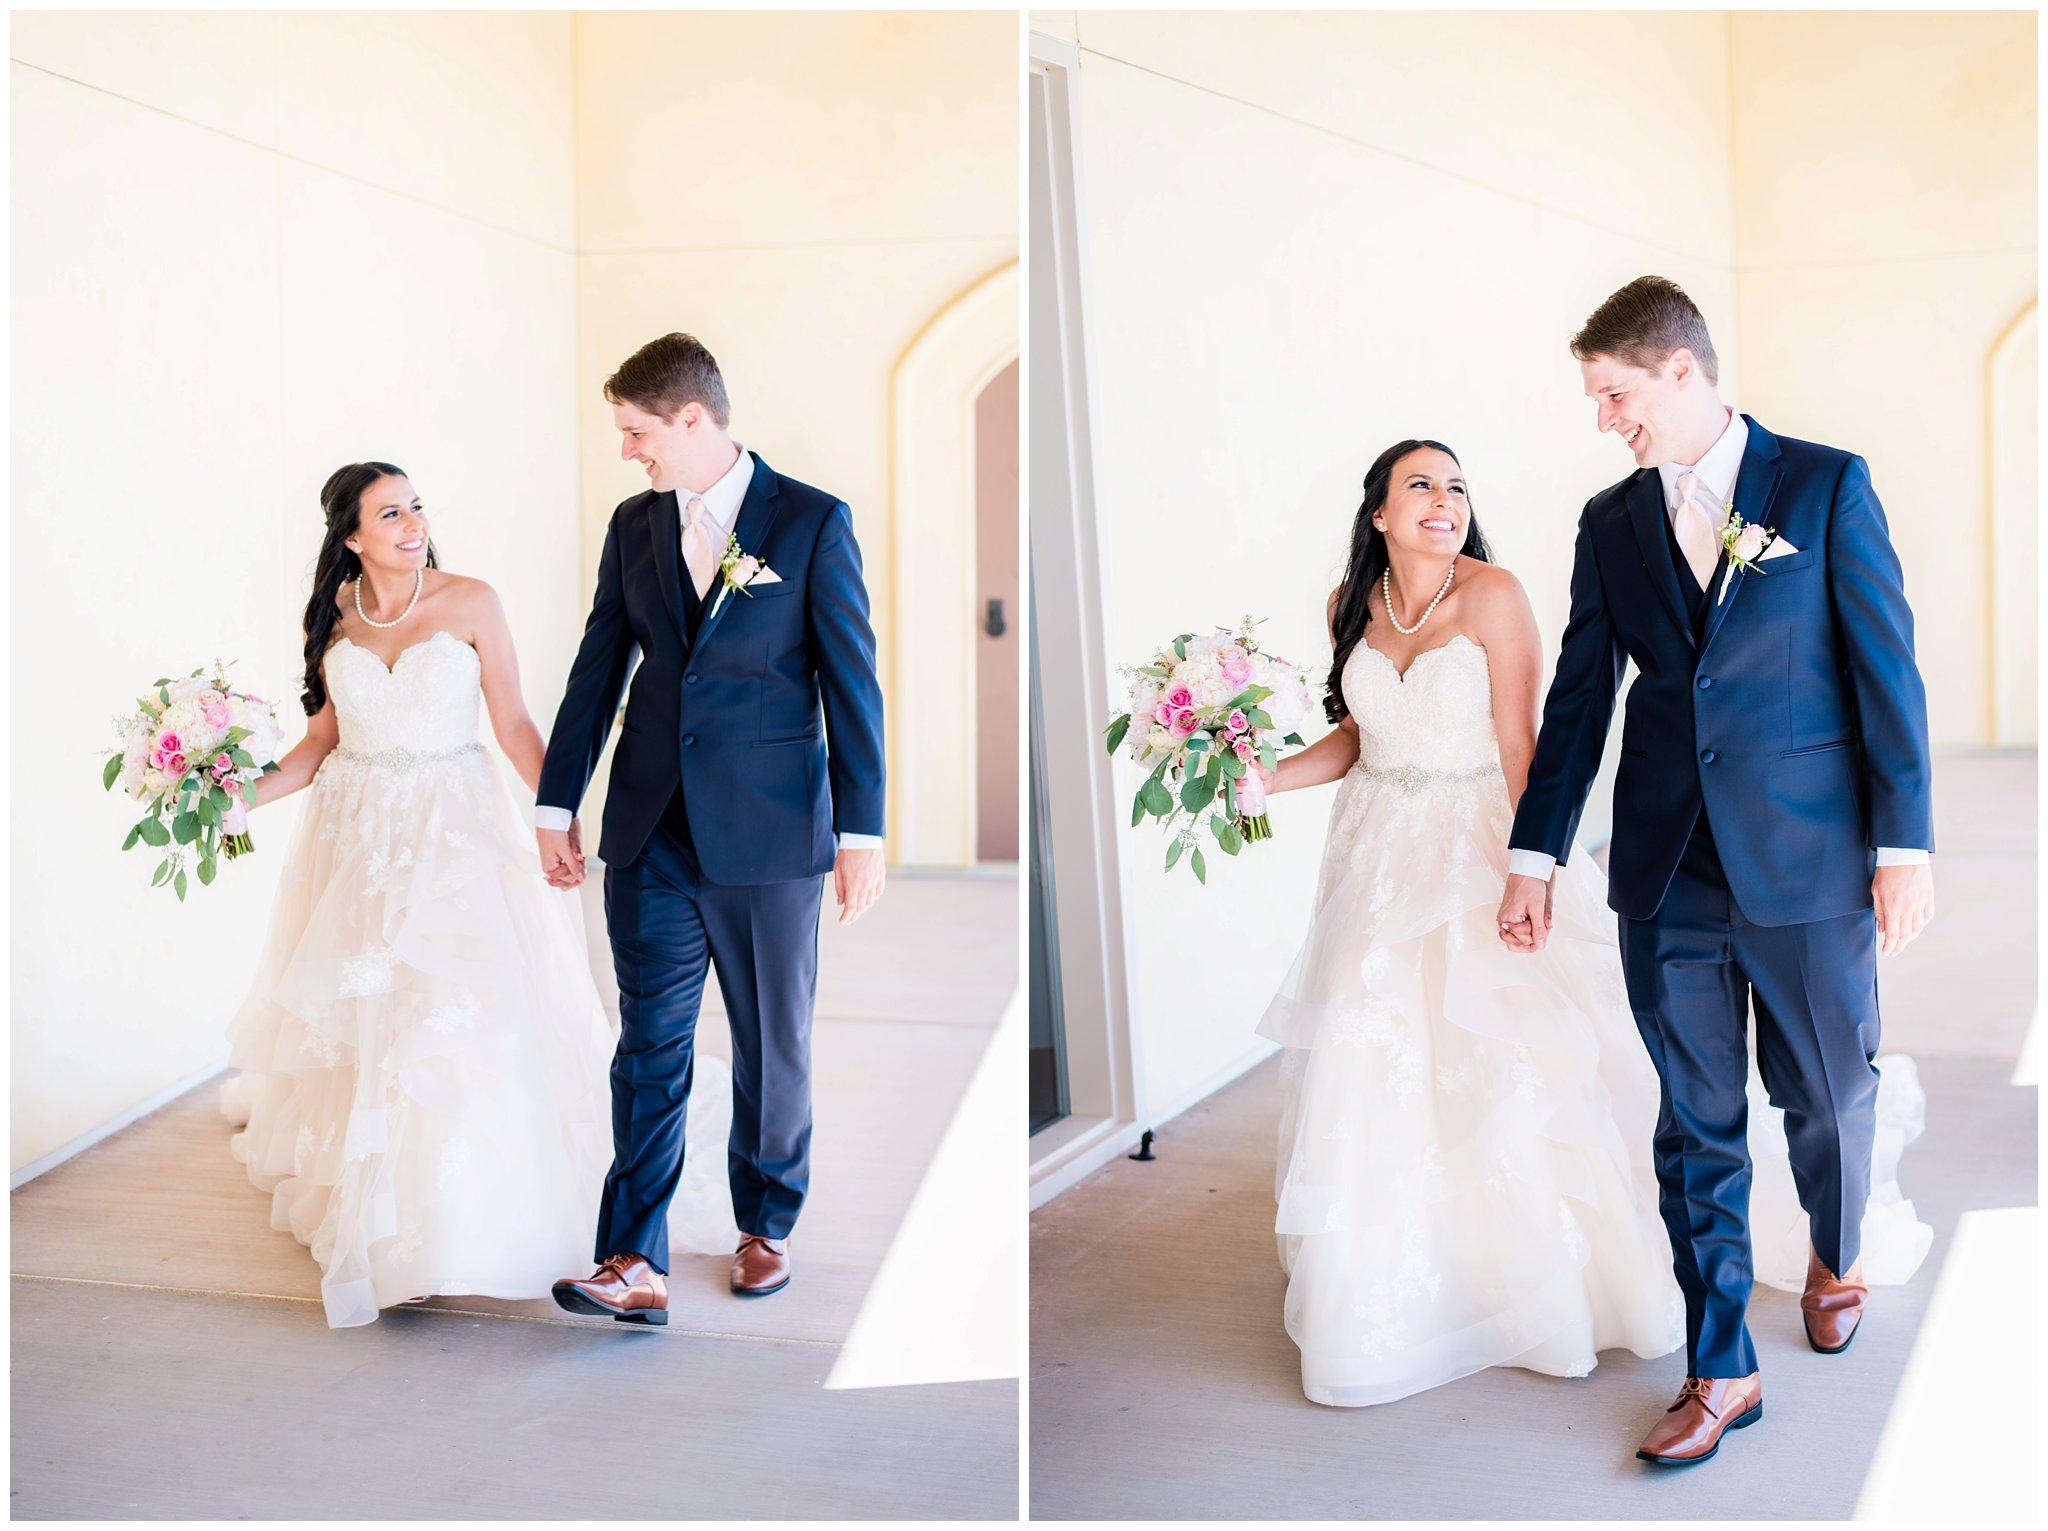 David-Girard-Vineyards-Wedding-Wedgewood-Weddings-29.jpg